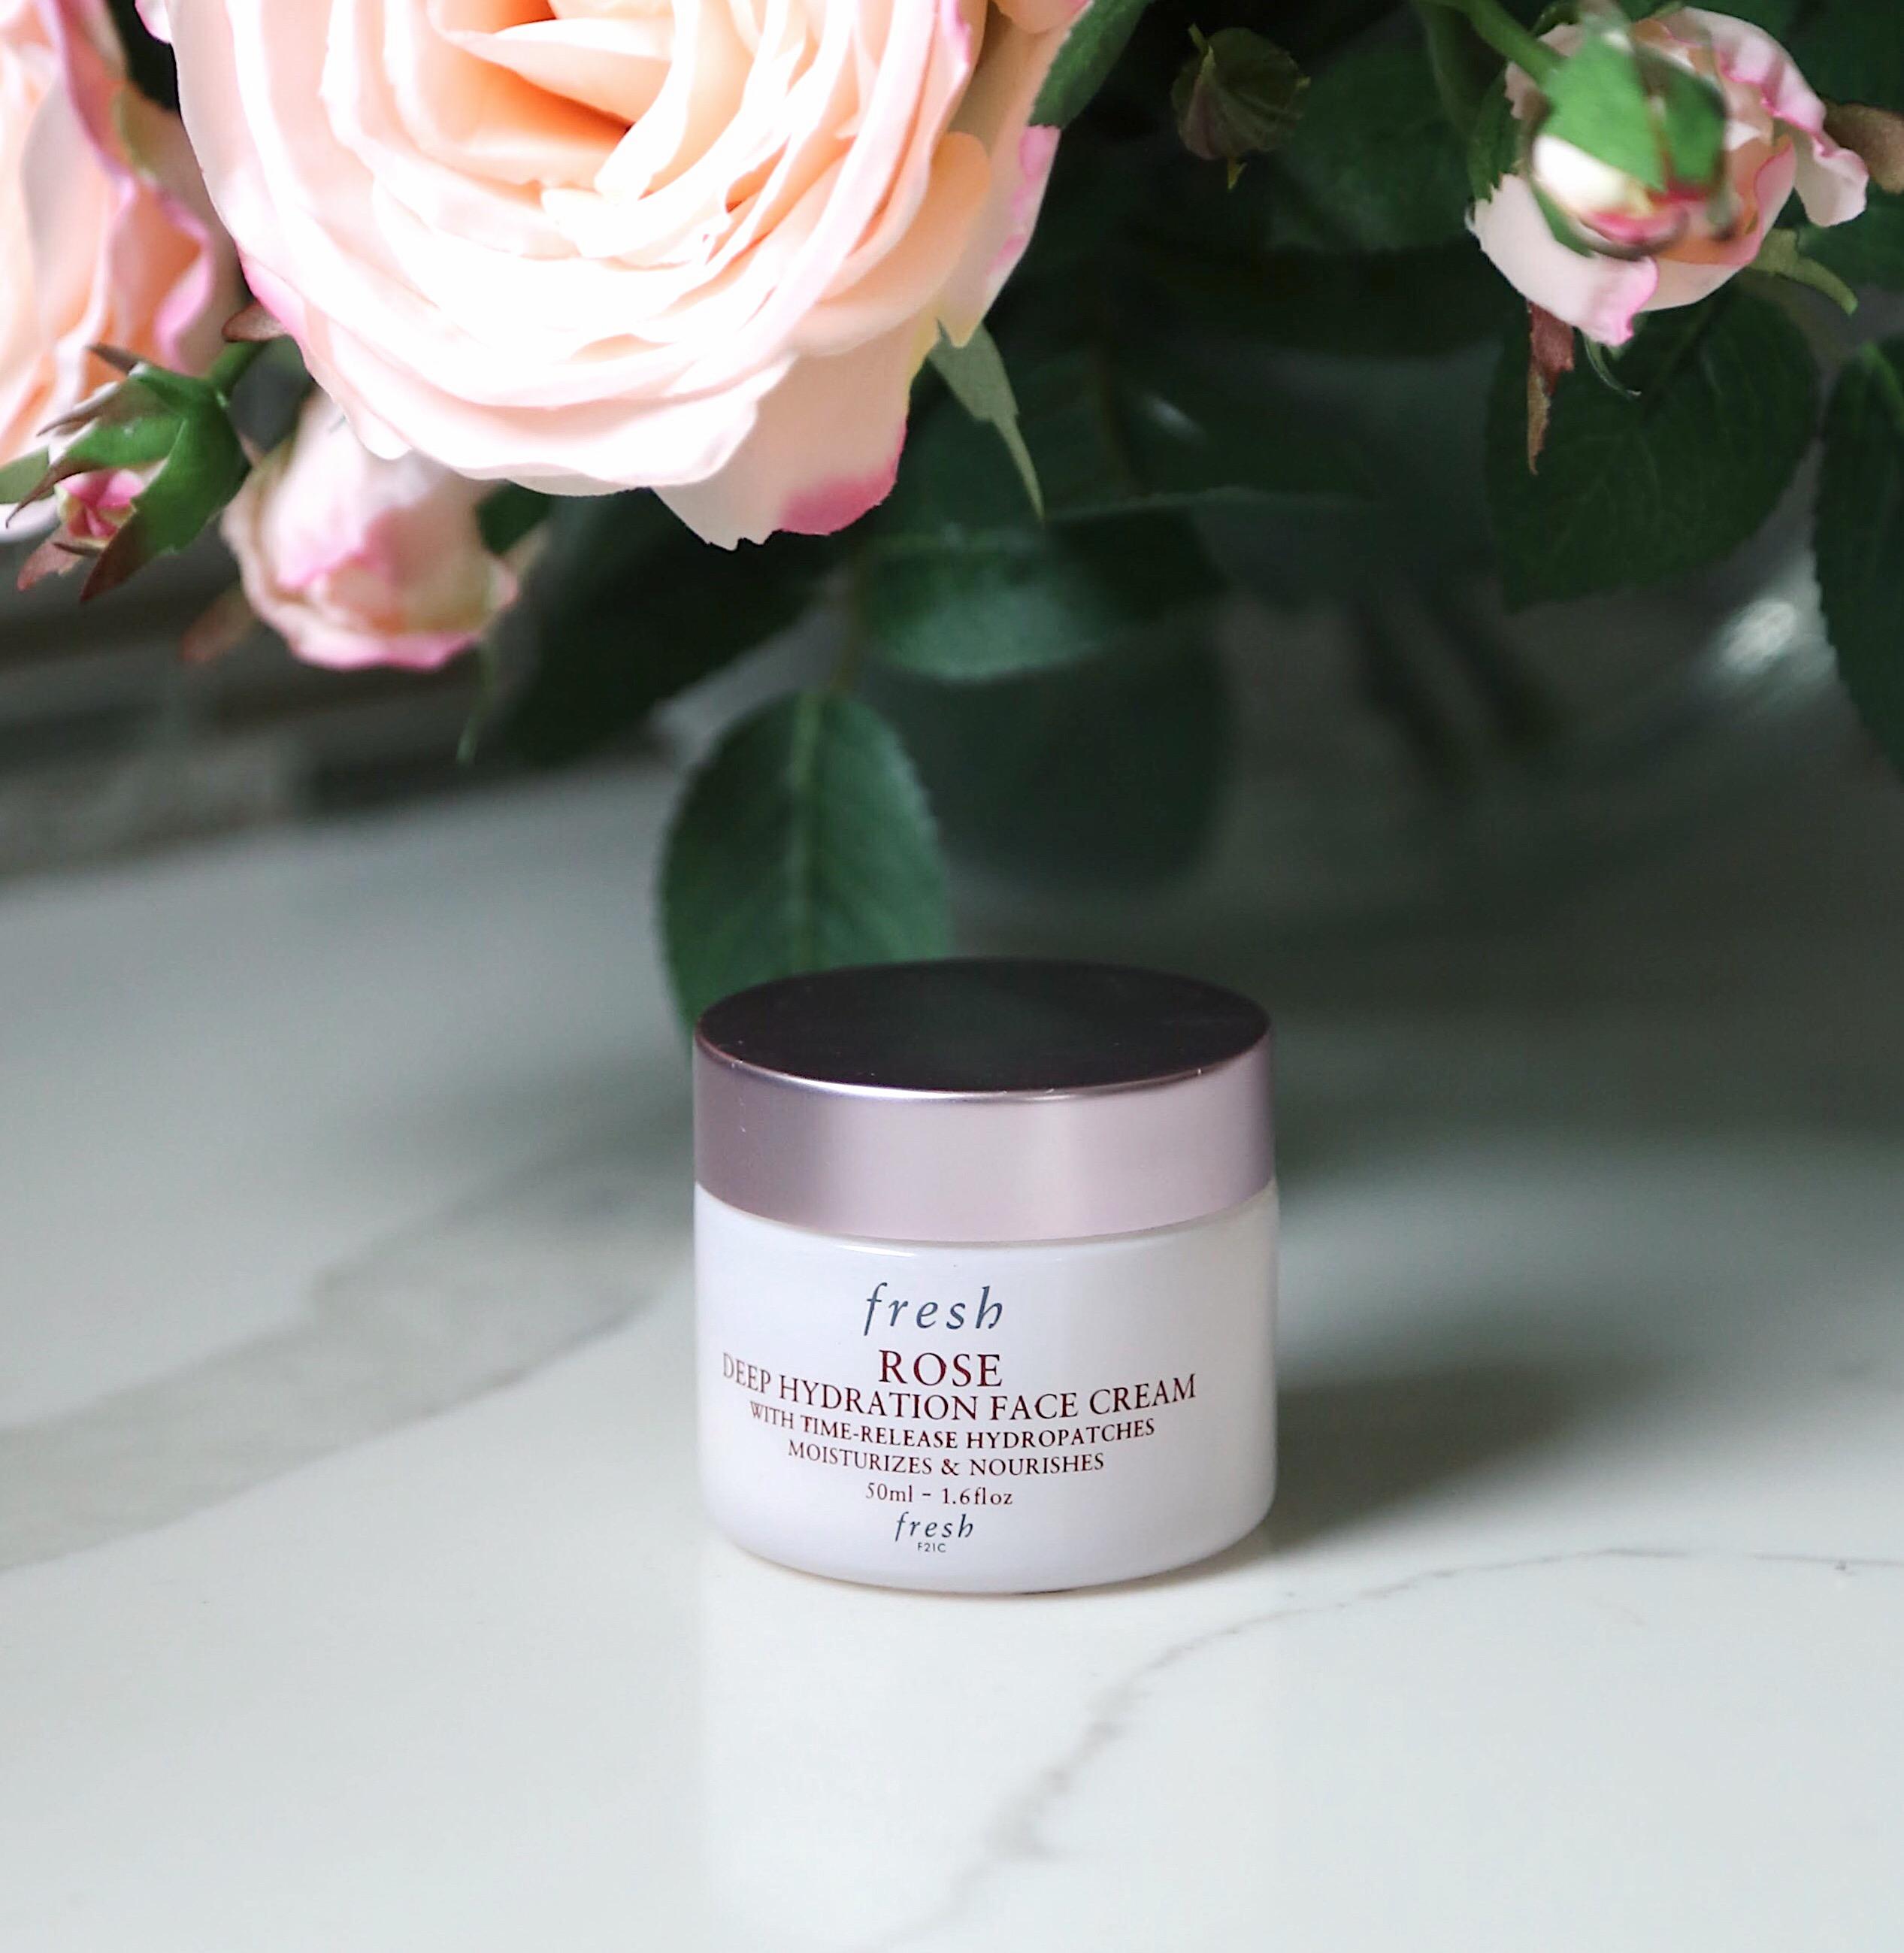 Fresh Rose Hydration Cream Review